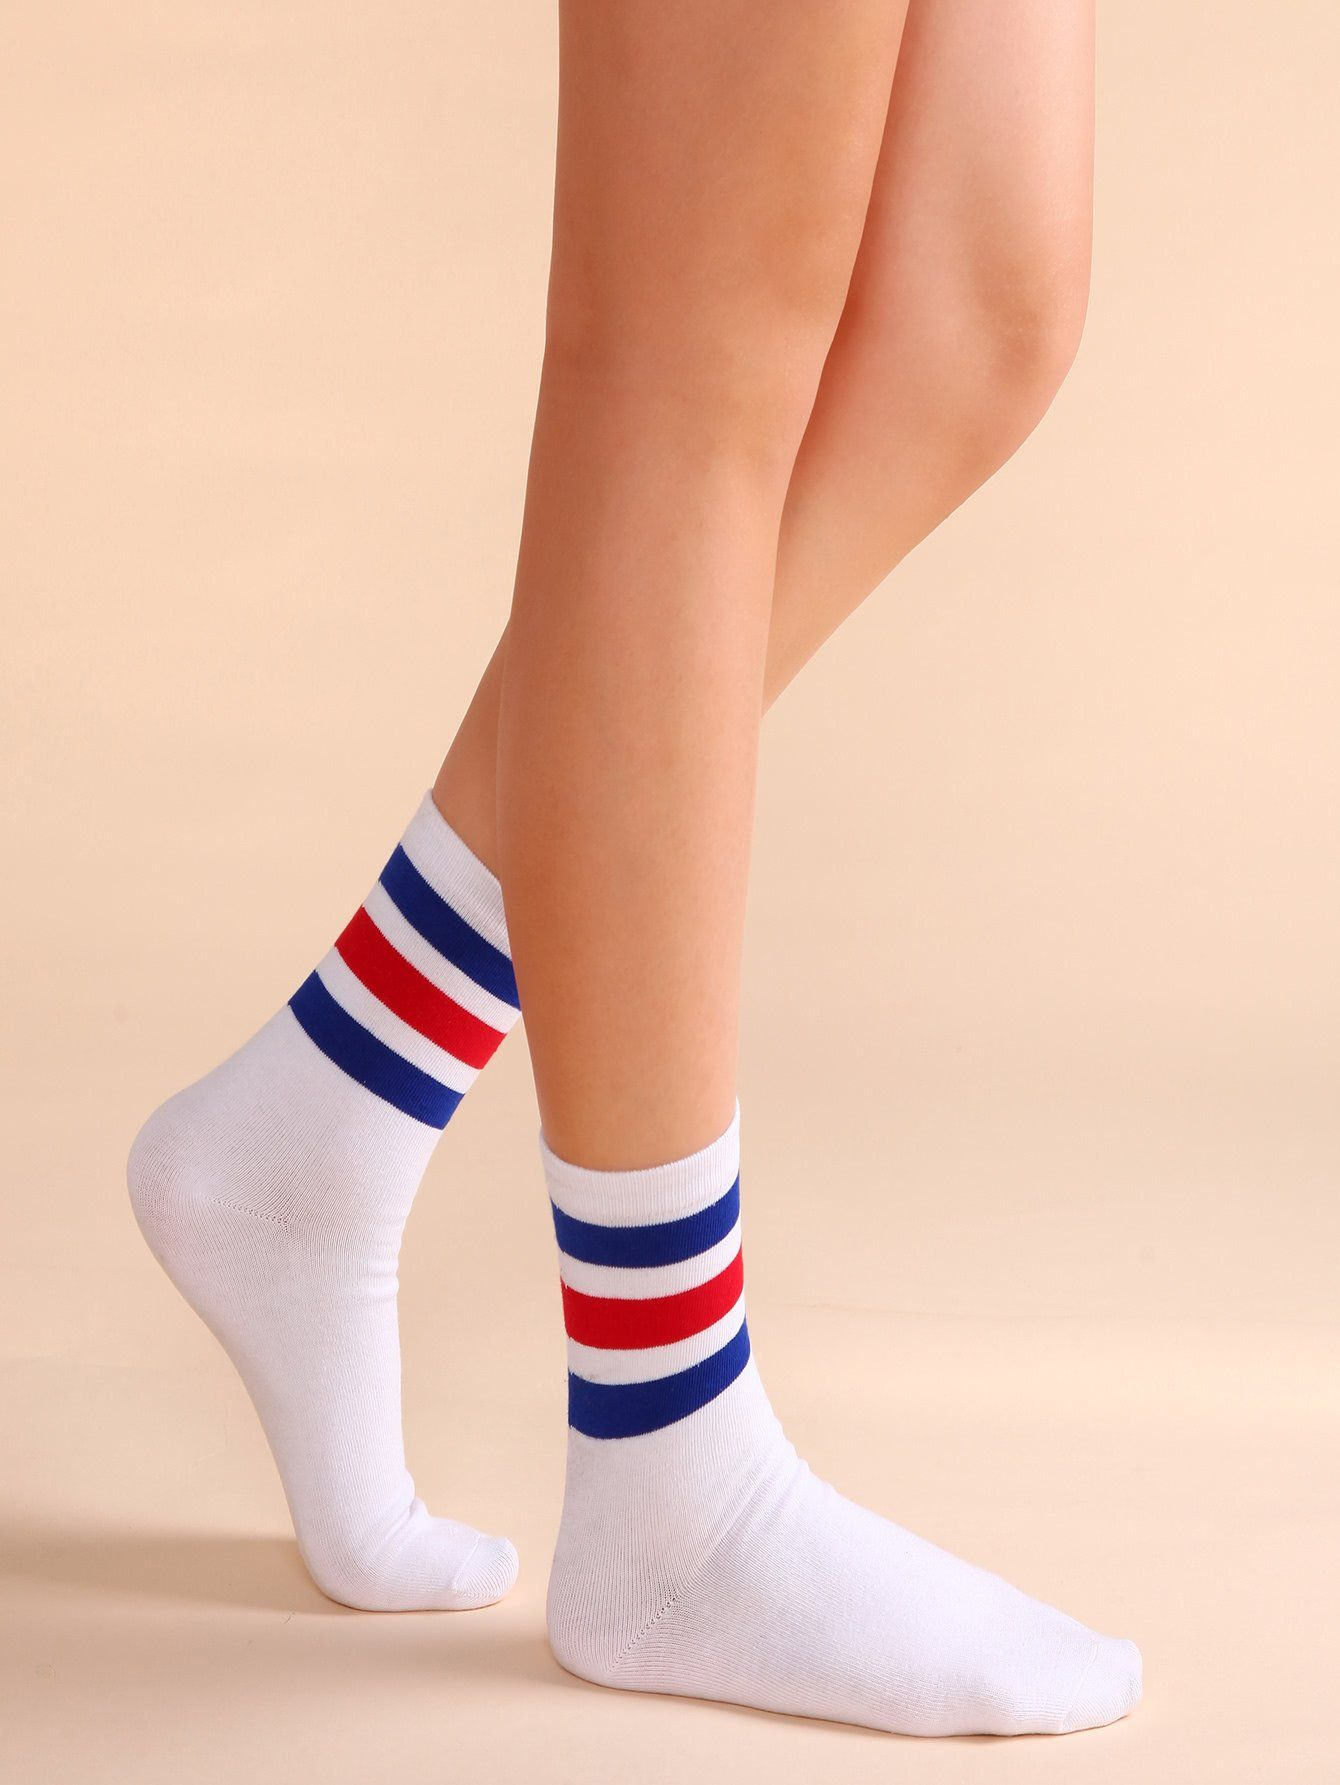 7f8ba0d8408a White Colored Stripe Trim Casual Crew Socks   jewlrey/cloтнeѕ/ѕнoeѕ ...